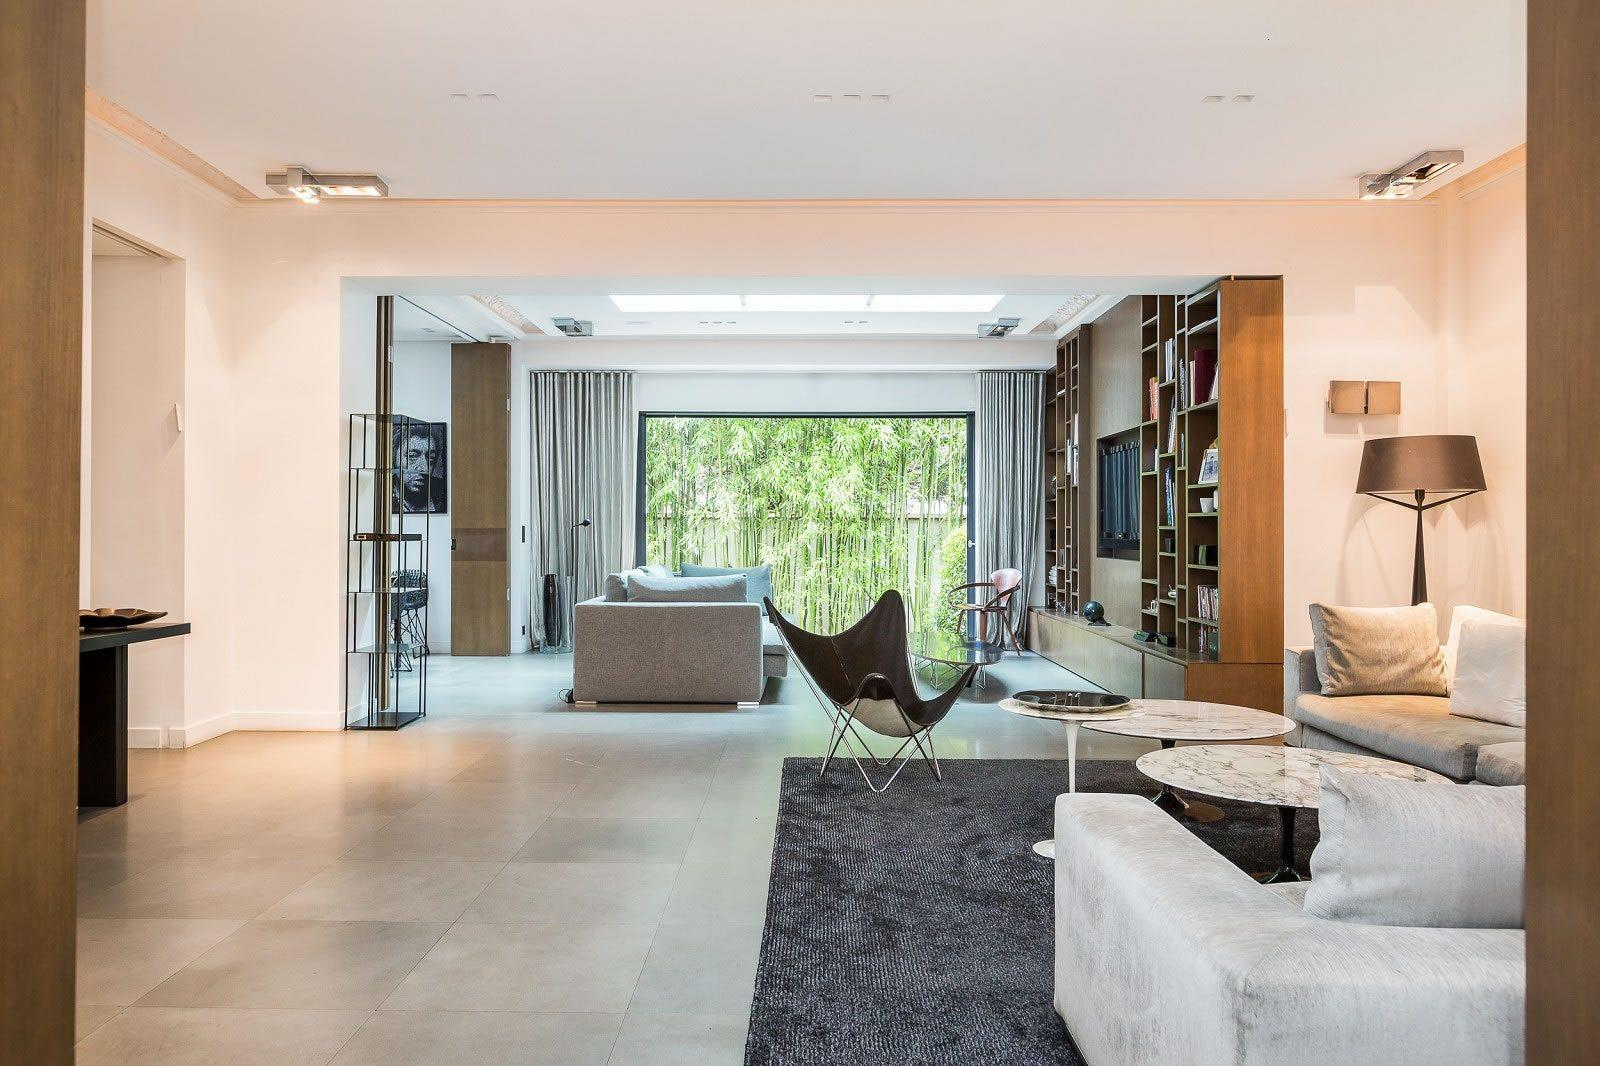 bel-hotel-particulier-style-mansard-a-vendre-saint-mande-jardin-privatif-terrasses-cinema